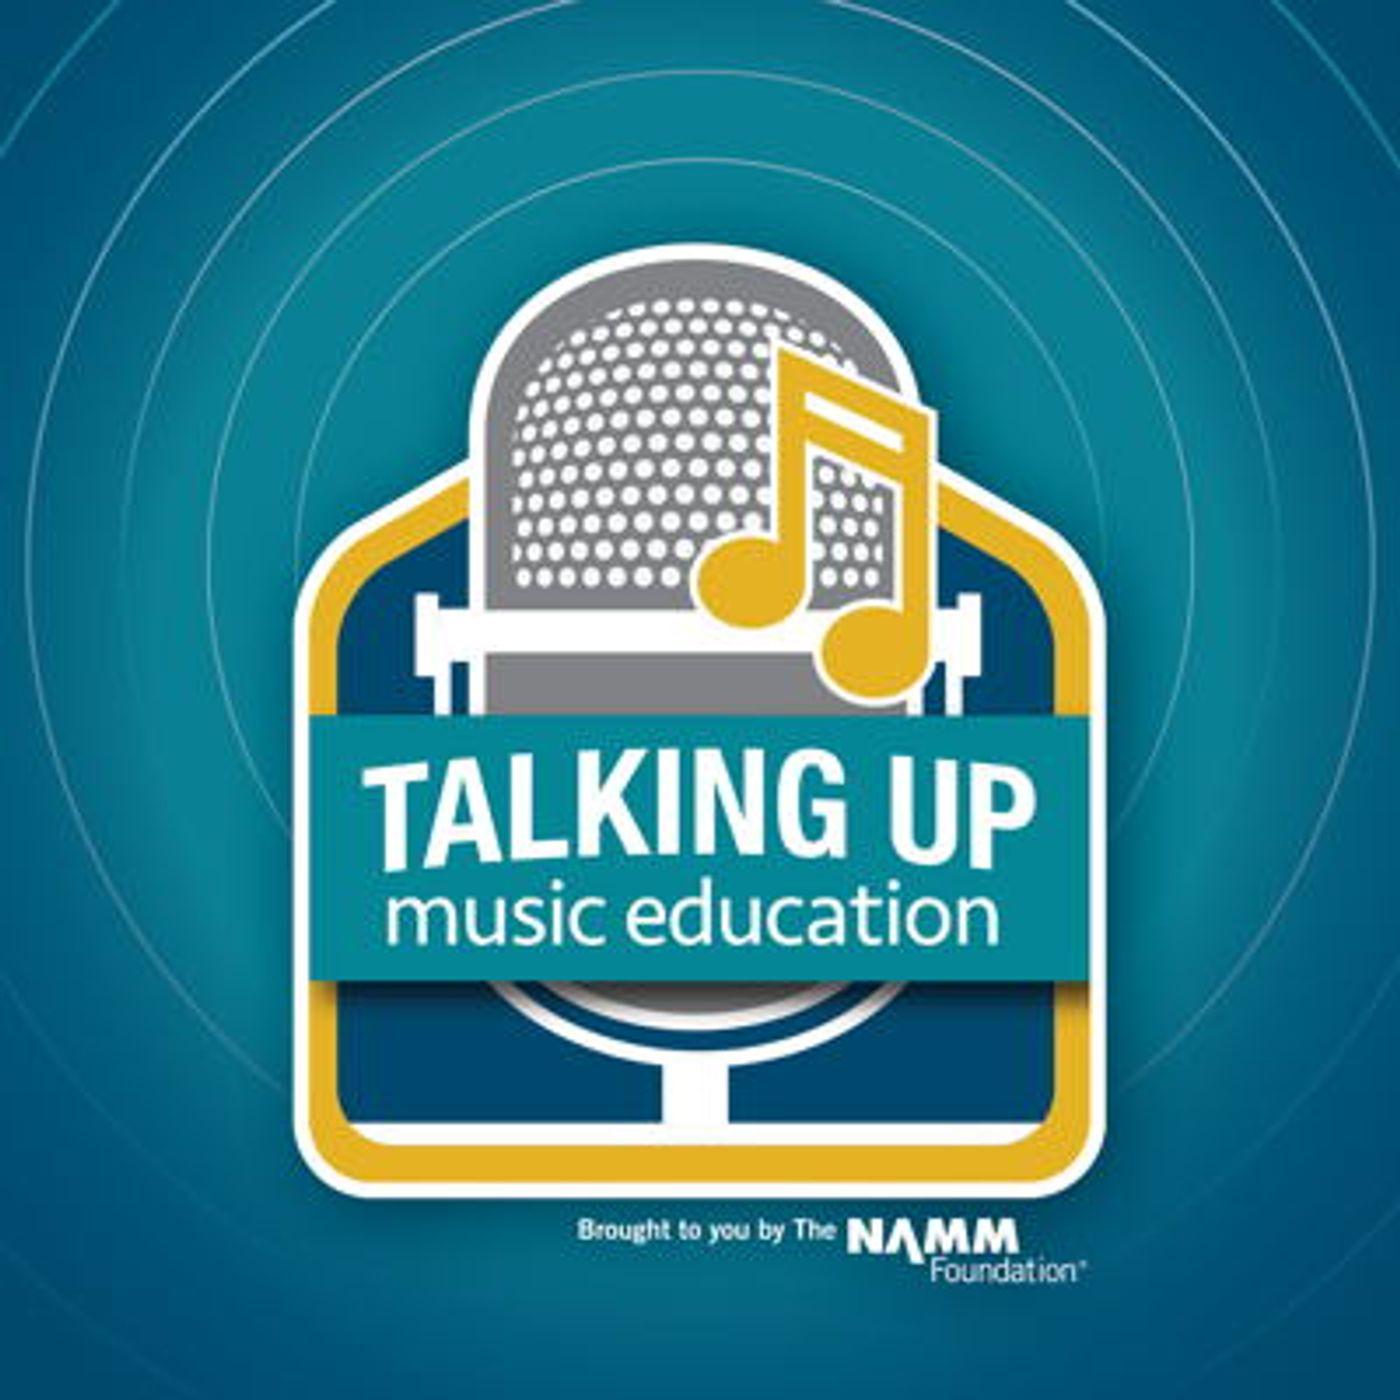 NAMM - Talking Up Music Education